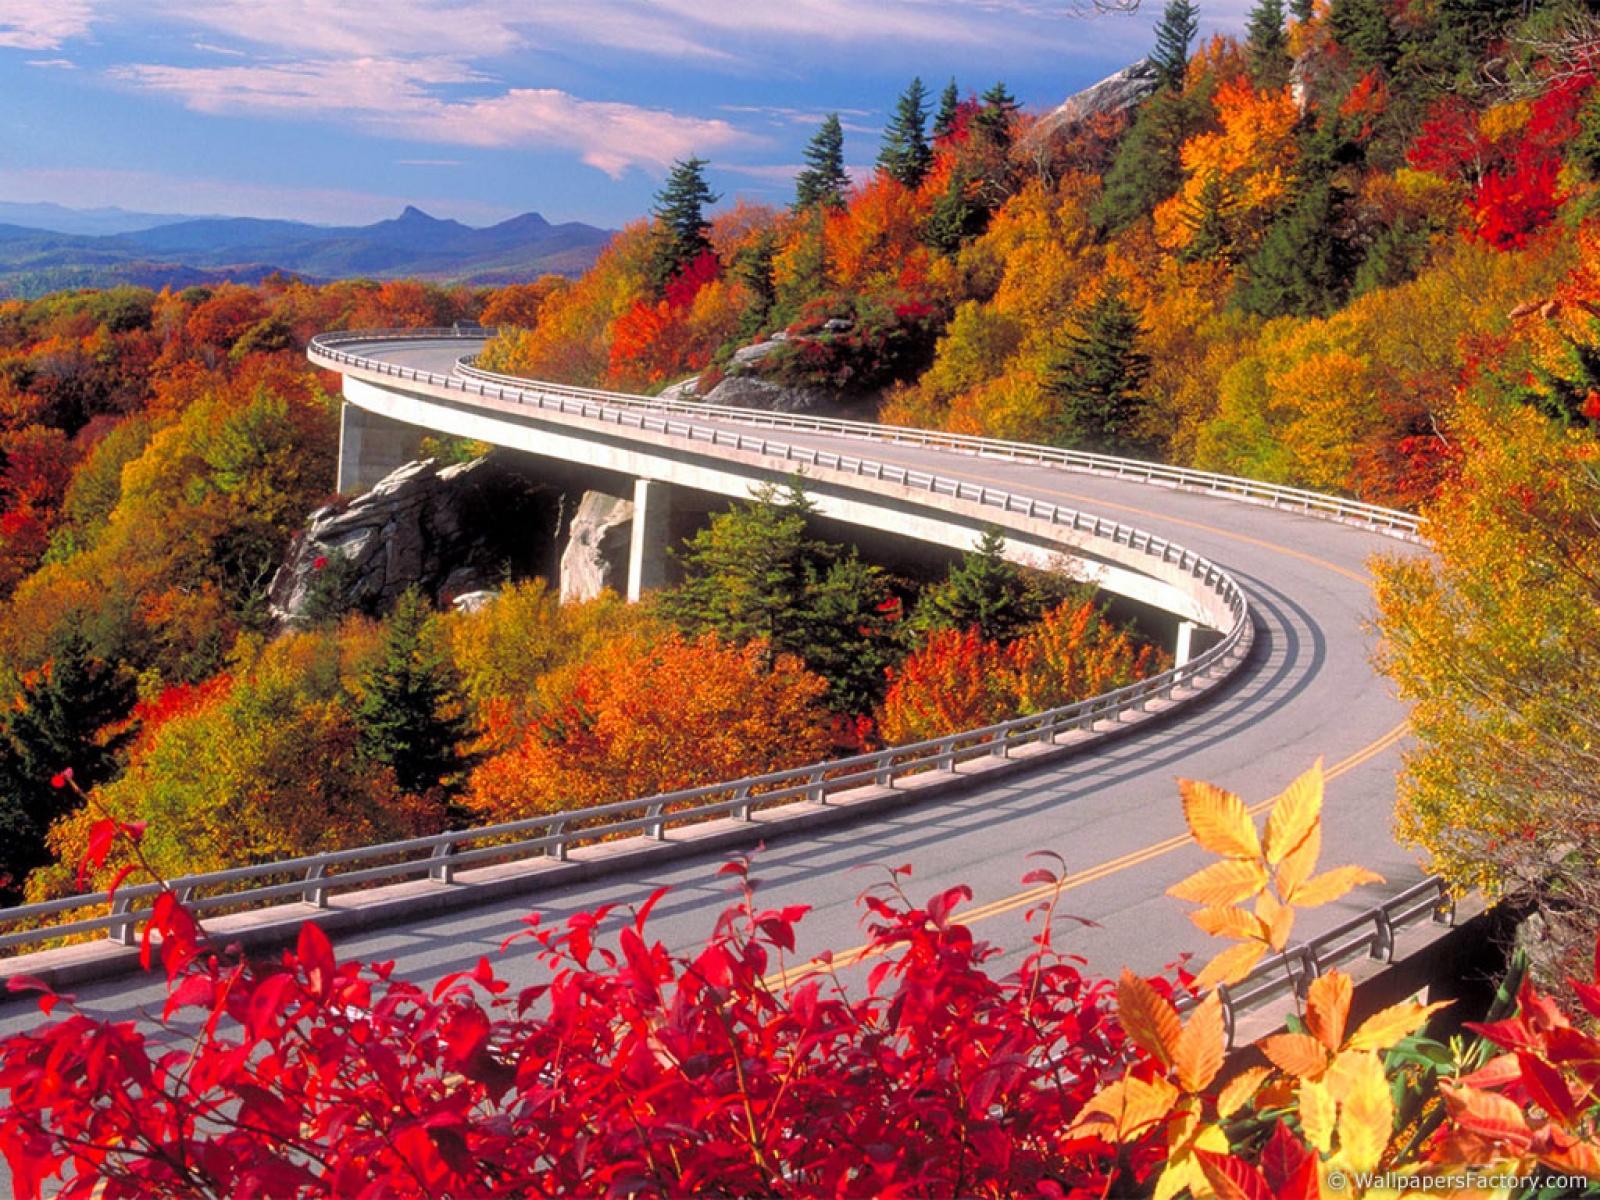 The best top autumn desktop wallpapers 33 En Güzel Sonbahar HD Duvar Kağıtları